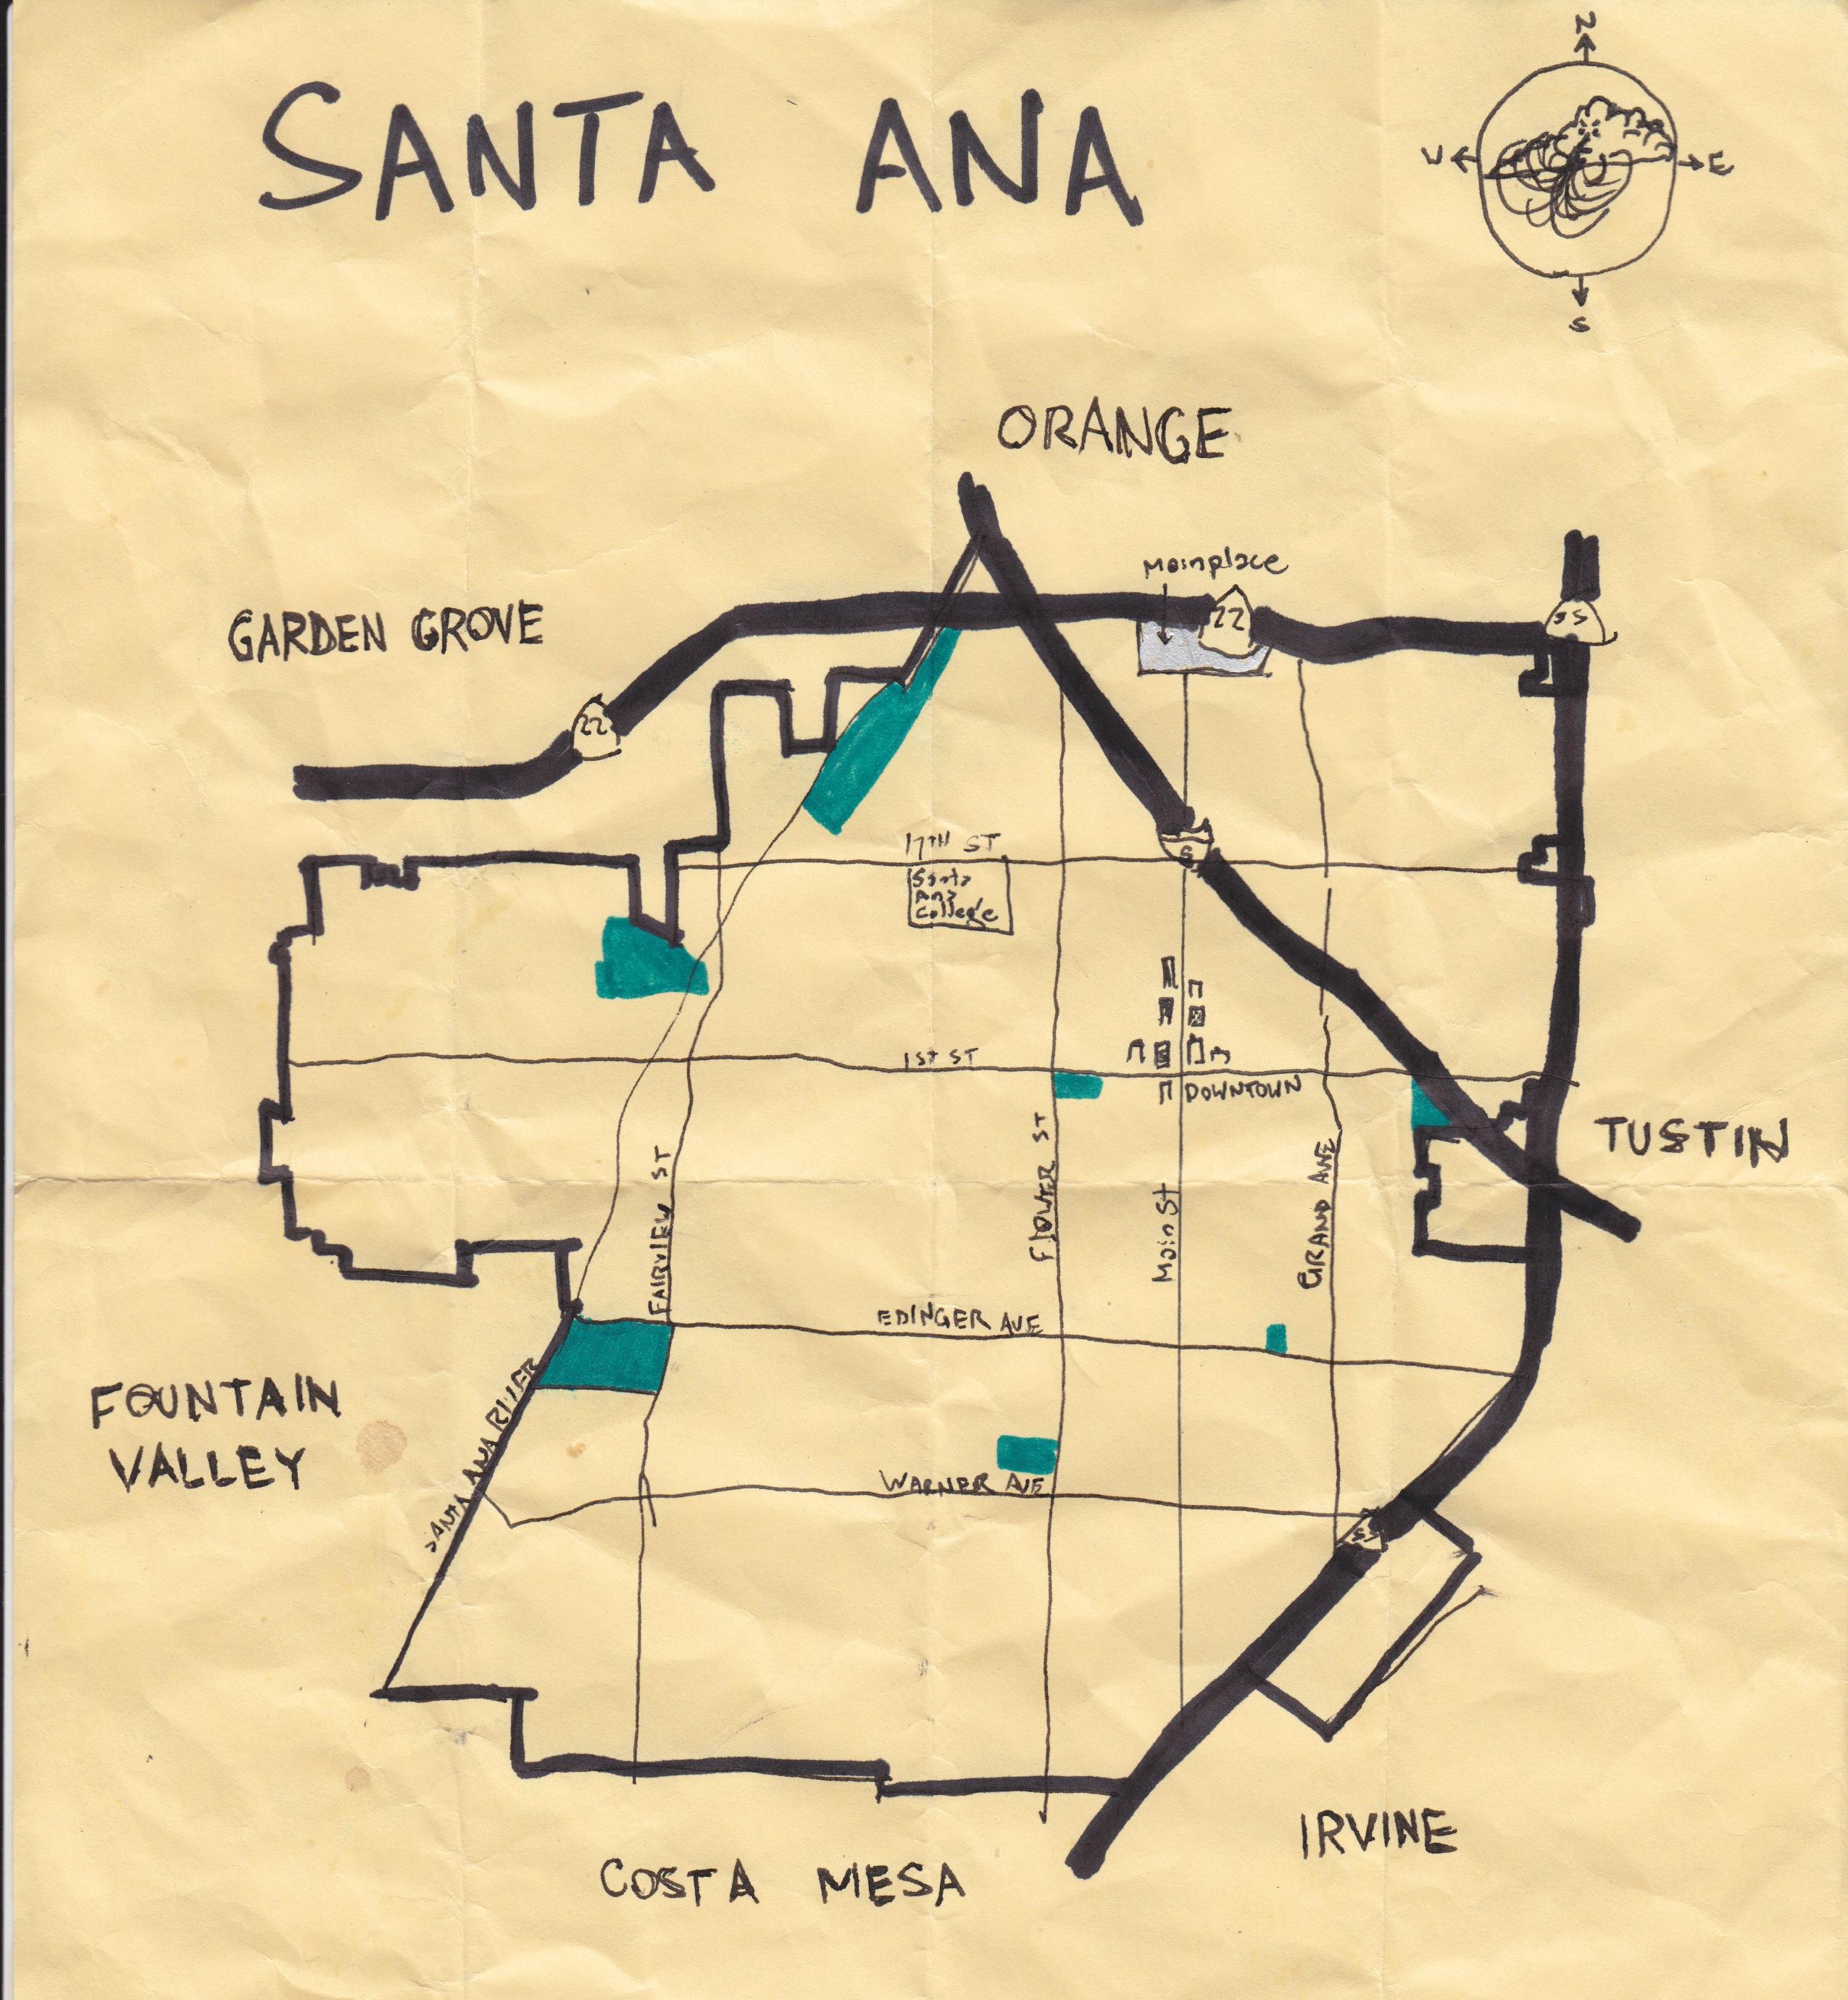 Santaana Detailed Of Map Where Is Santa Ana California On Map - Santa Ana California Map